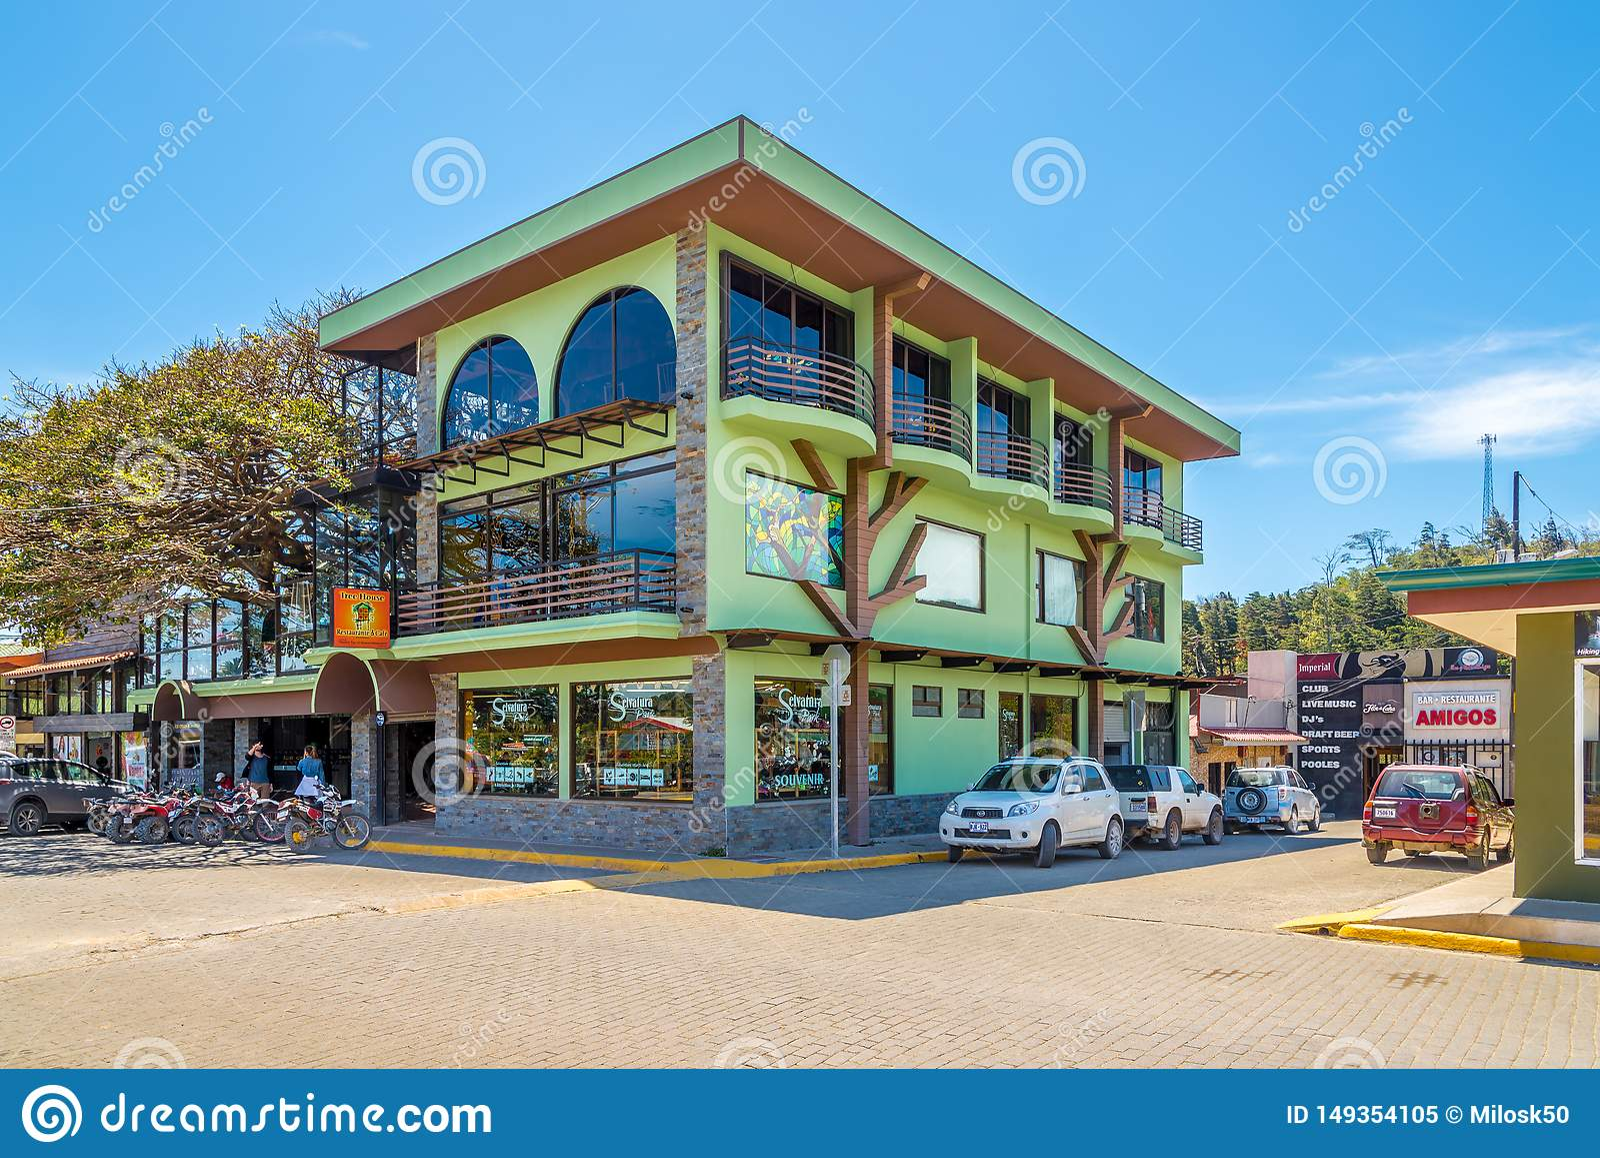 streets-santa-elena-monteverde-costa-rica-march-was-deemed-one-seven-natural-wonders-149354105.jpg